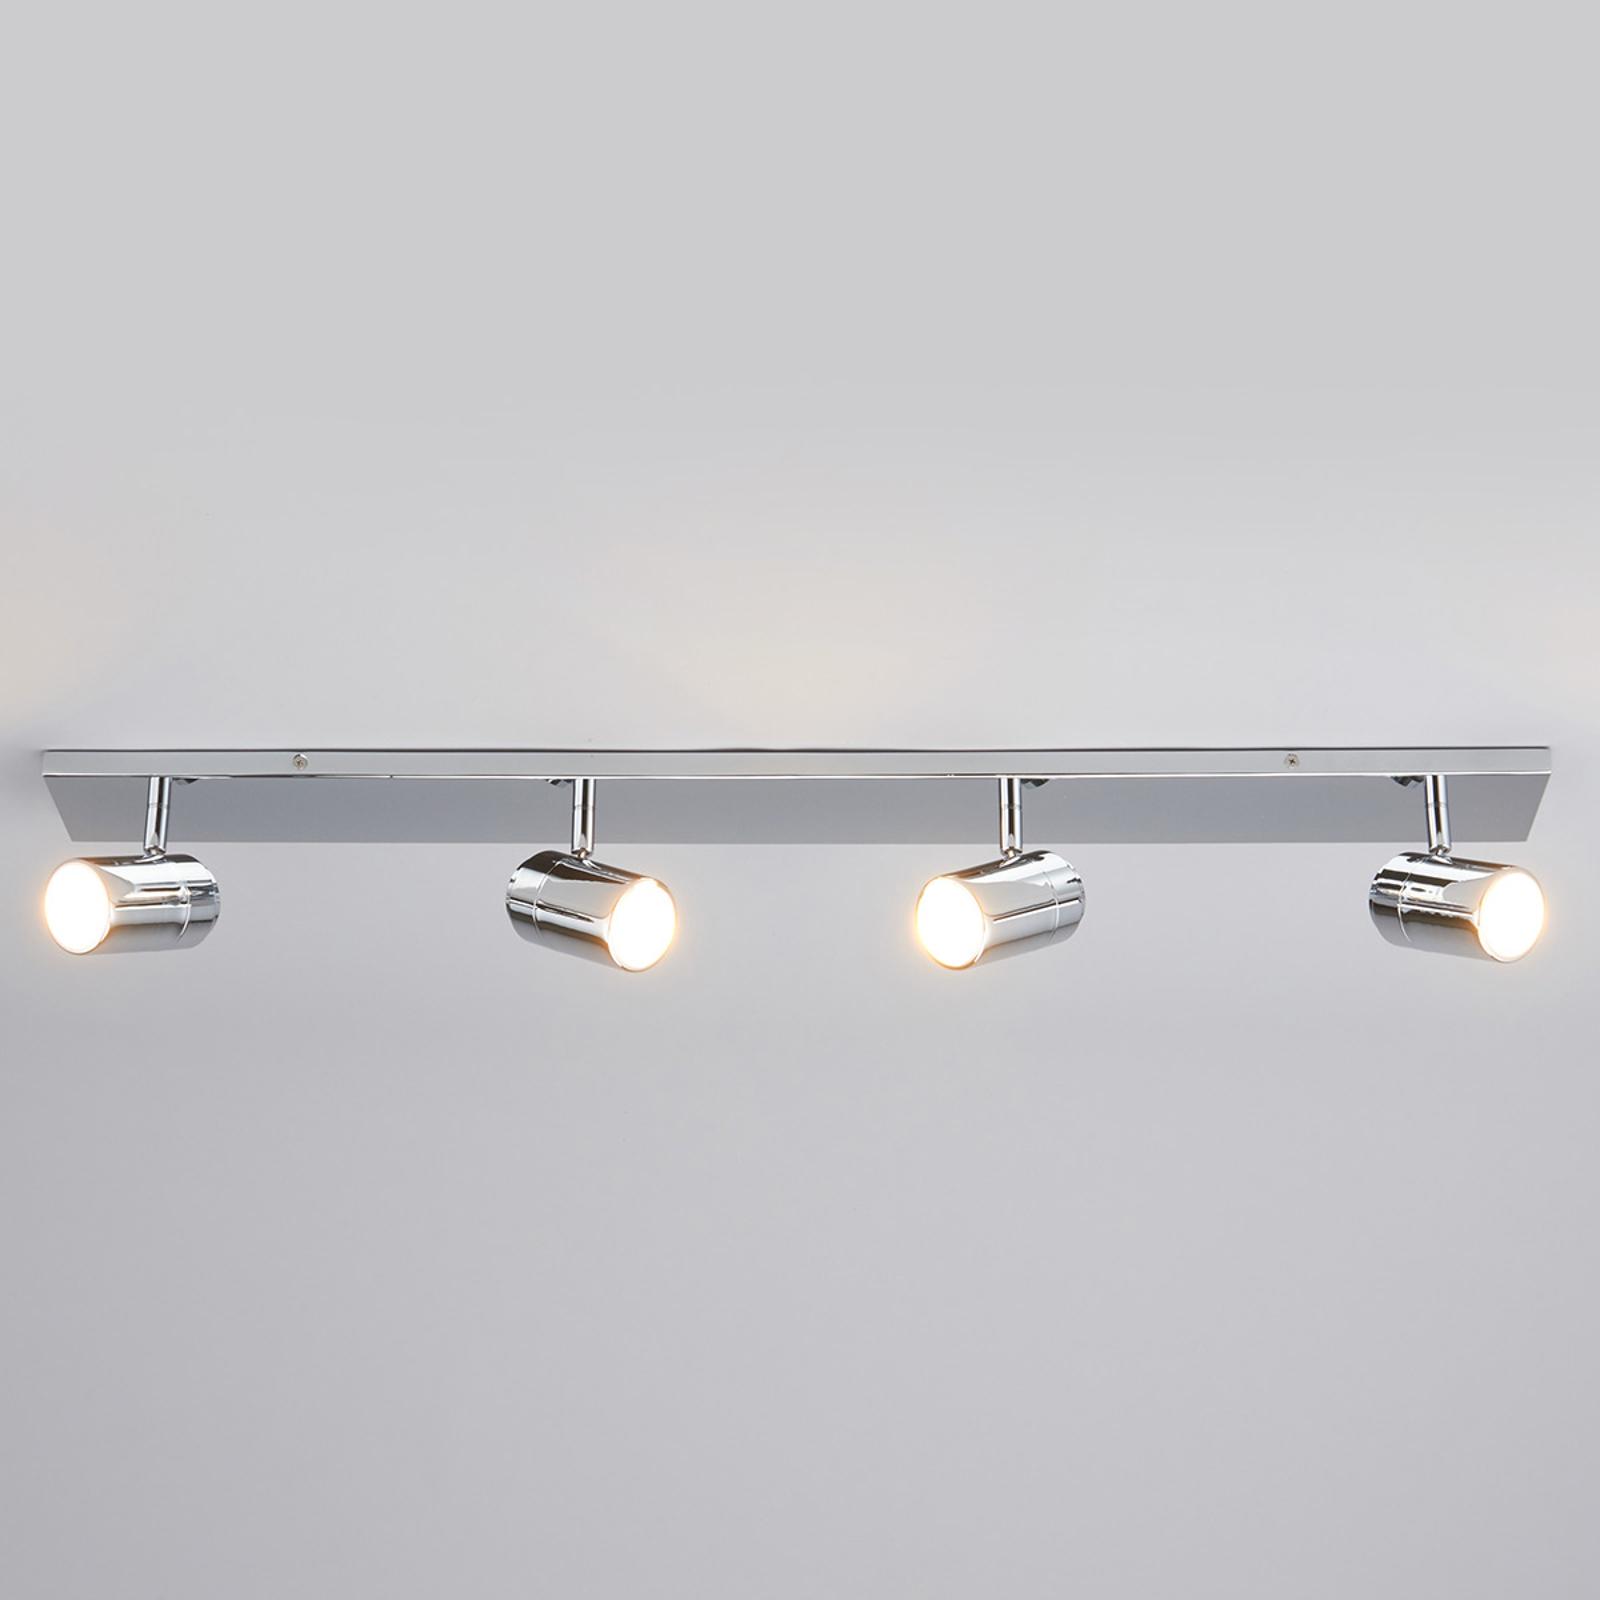 Dejan - badelampe til loftet med 4 lyskilder